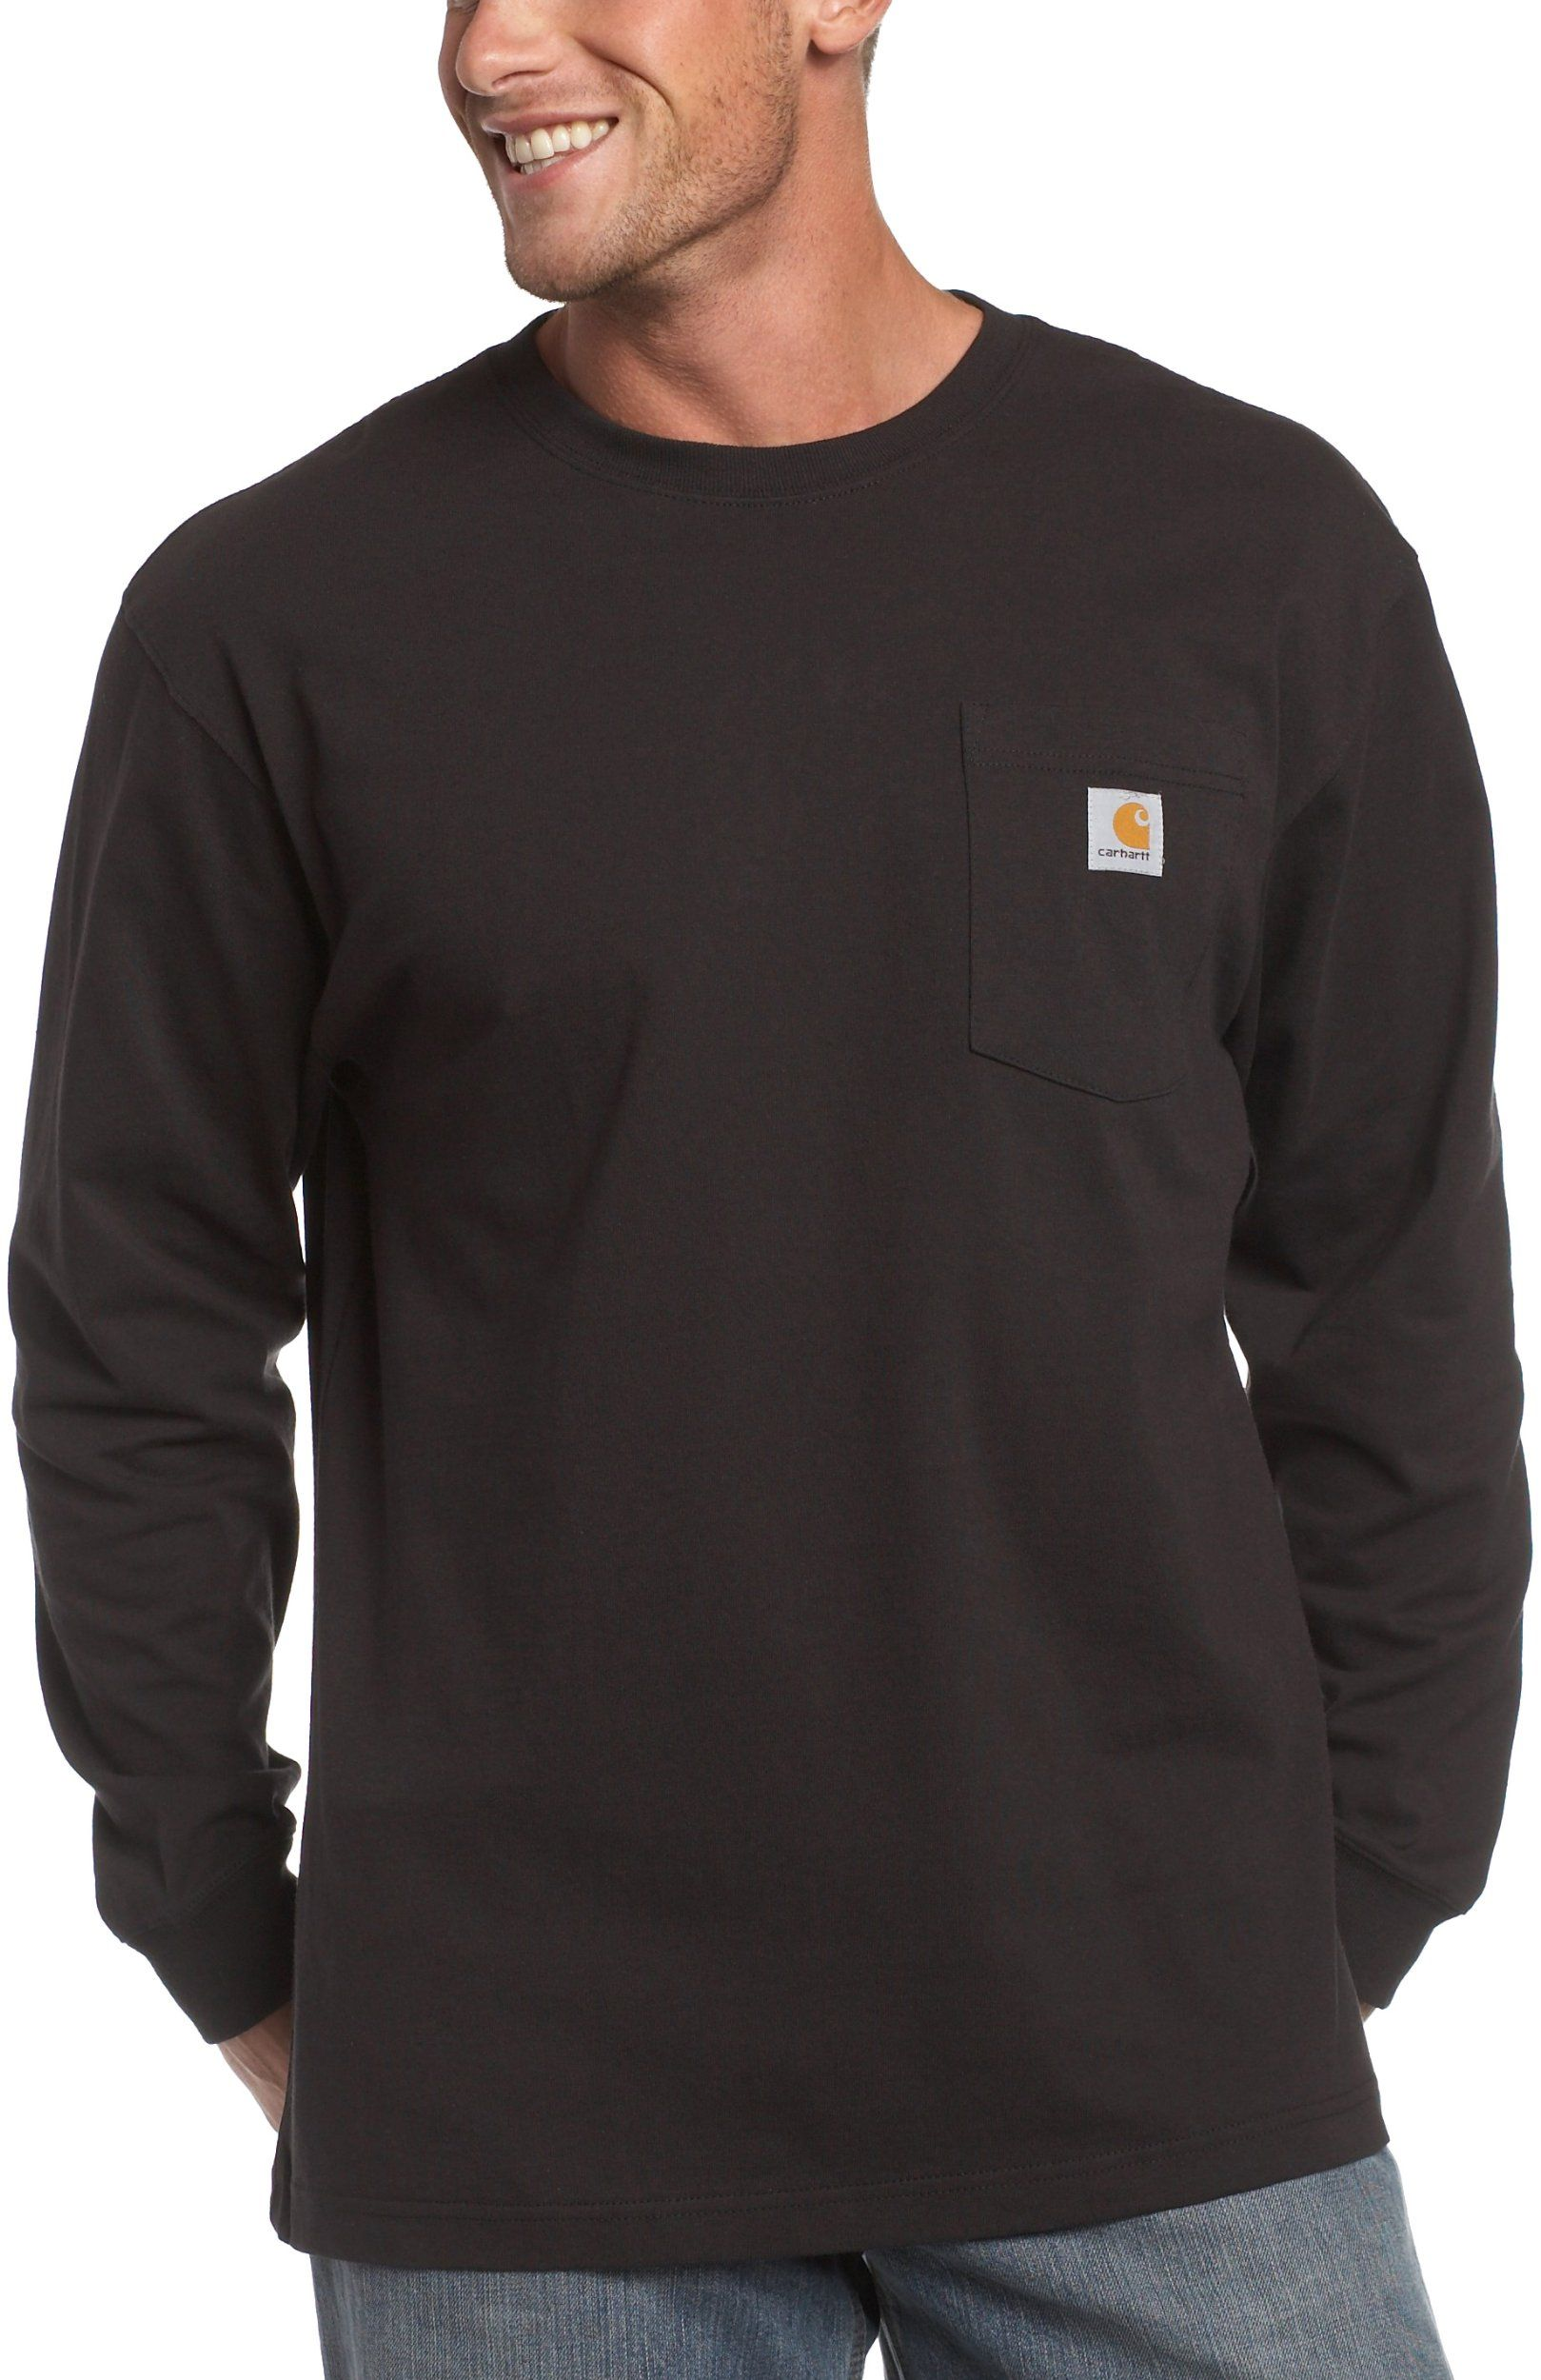 6ead98f83a Amazon.com  Carhartt Men s Workwear Pocket Long Sleeve T Shirt  Work  Utility Shirts  Clothing